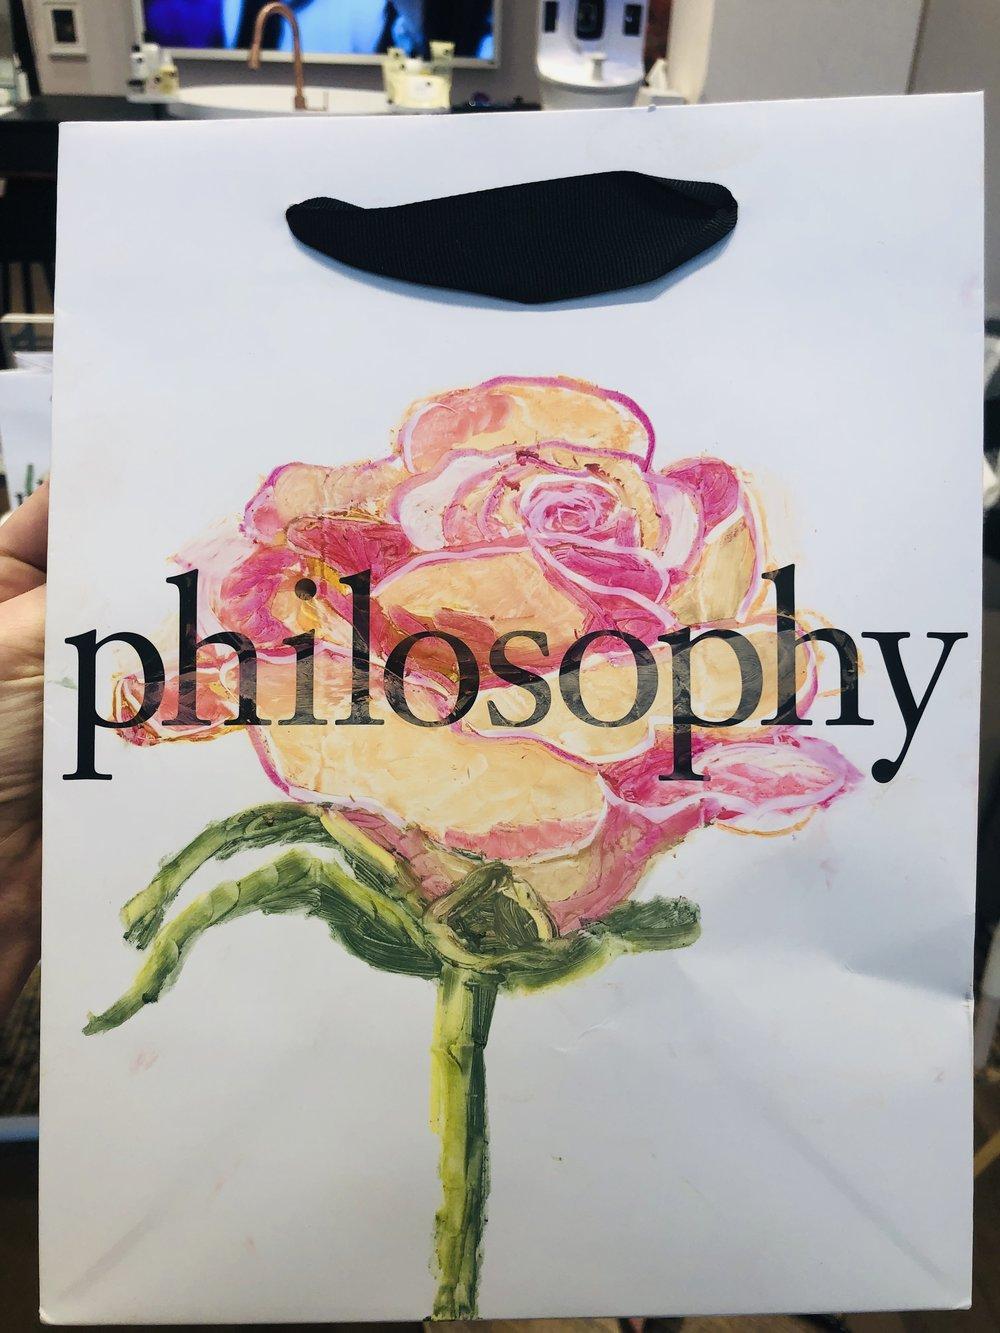 katrina-eugenia-philosophy-skincare-love-philosophy-amazing-grace-amazing-grace-ballet-rose-live-painting-oil-painting22.jpg